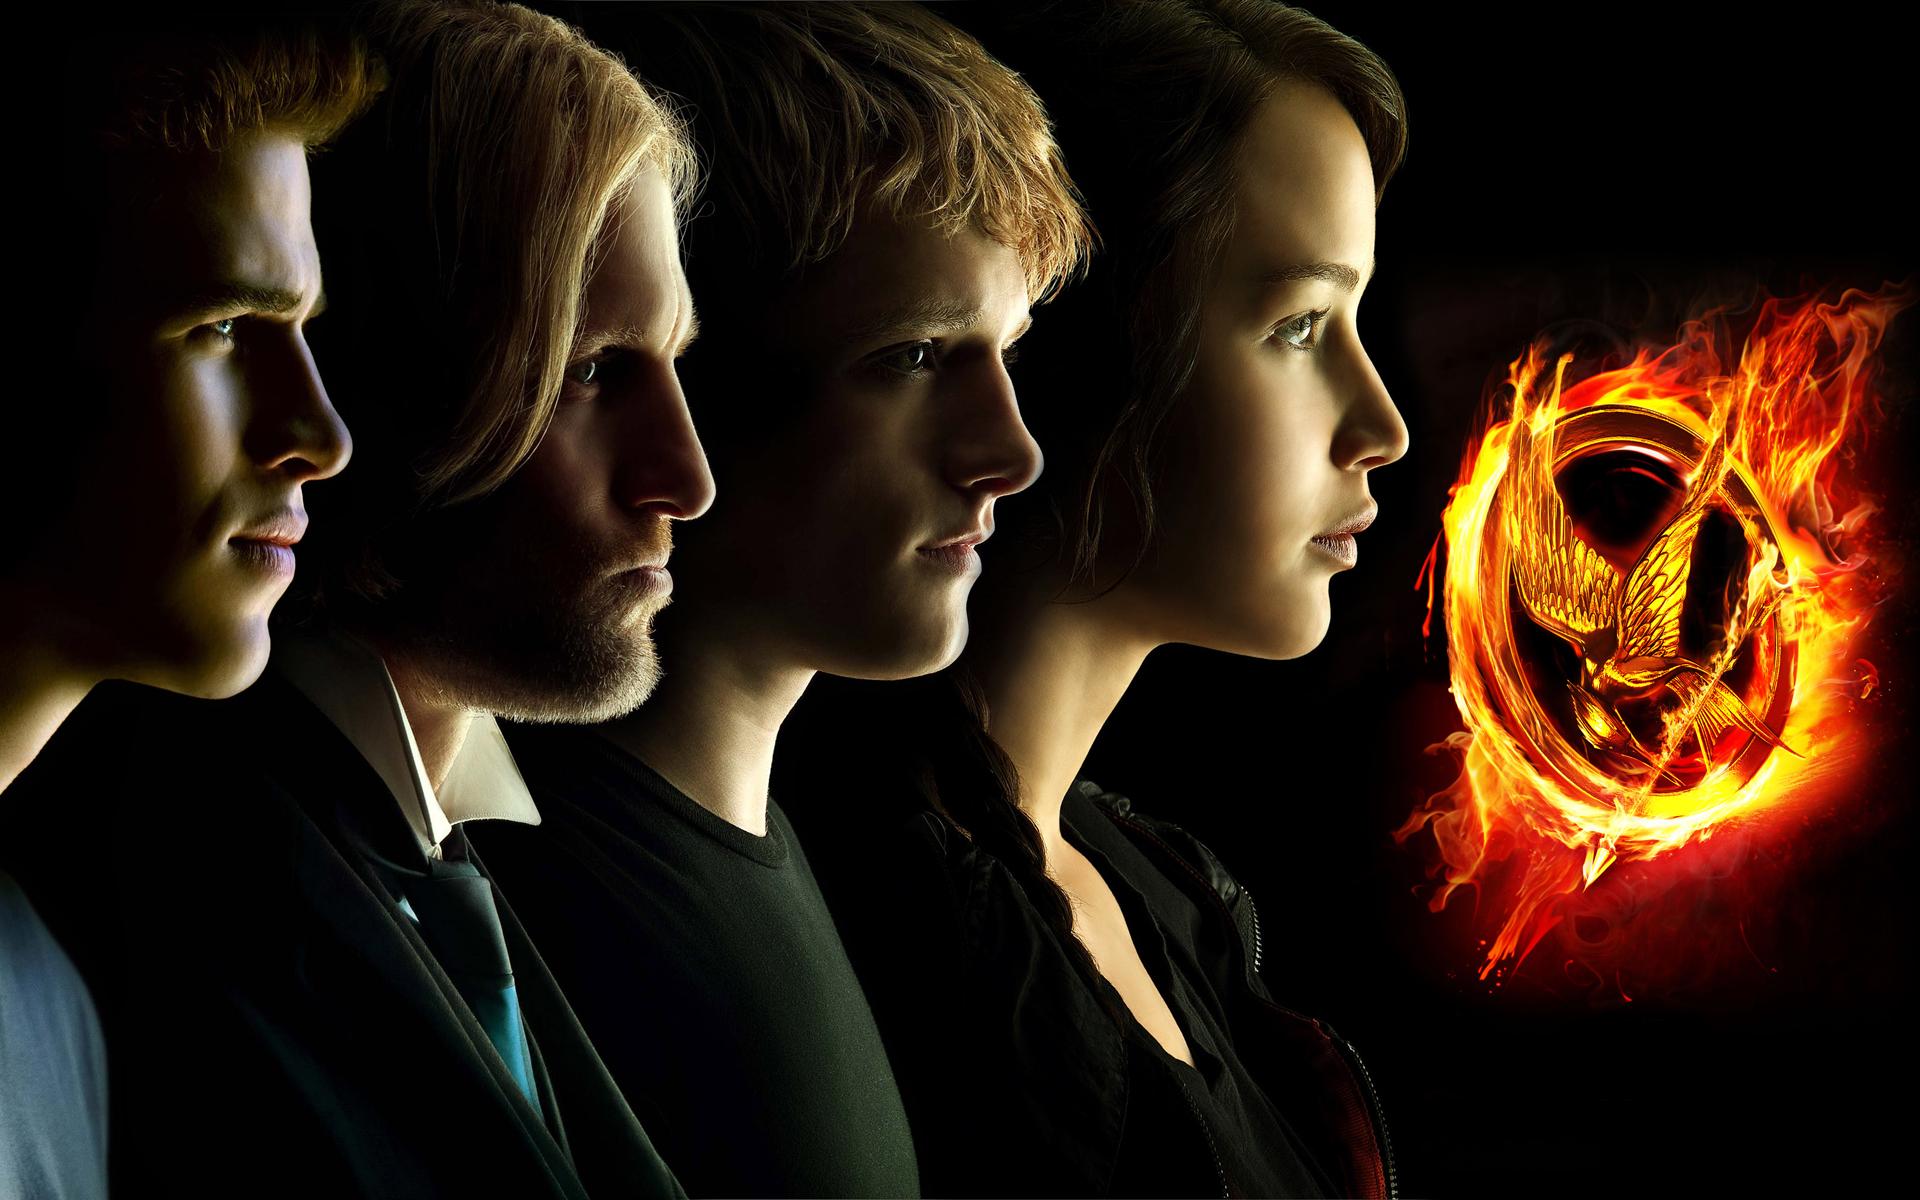 The Hunger Games wallpaper 10